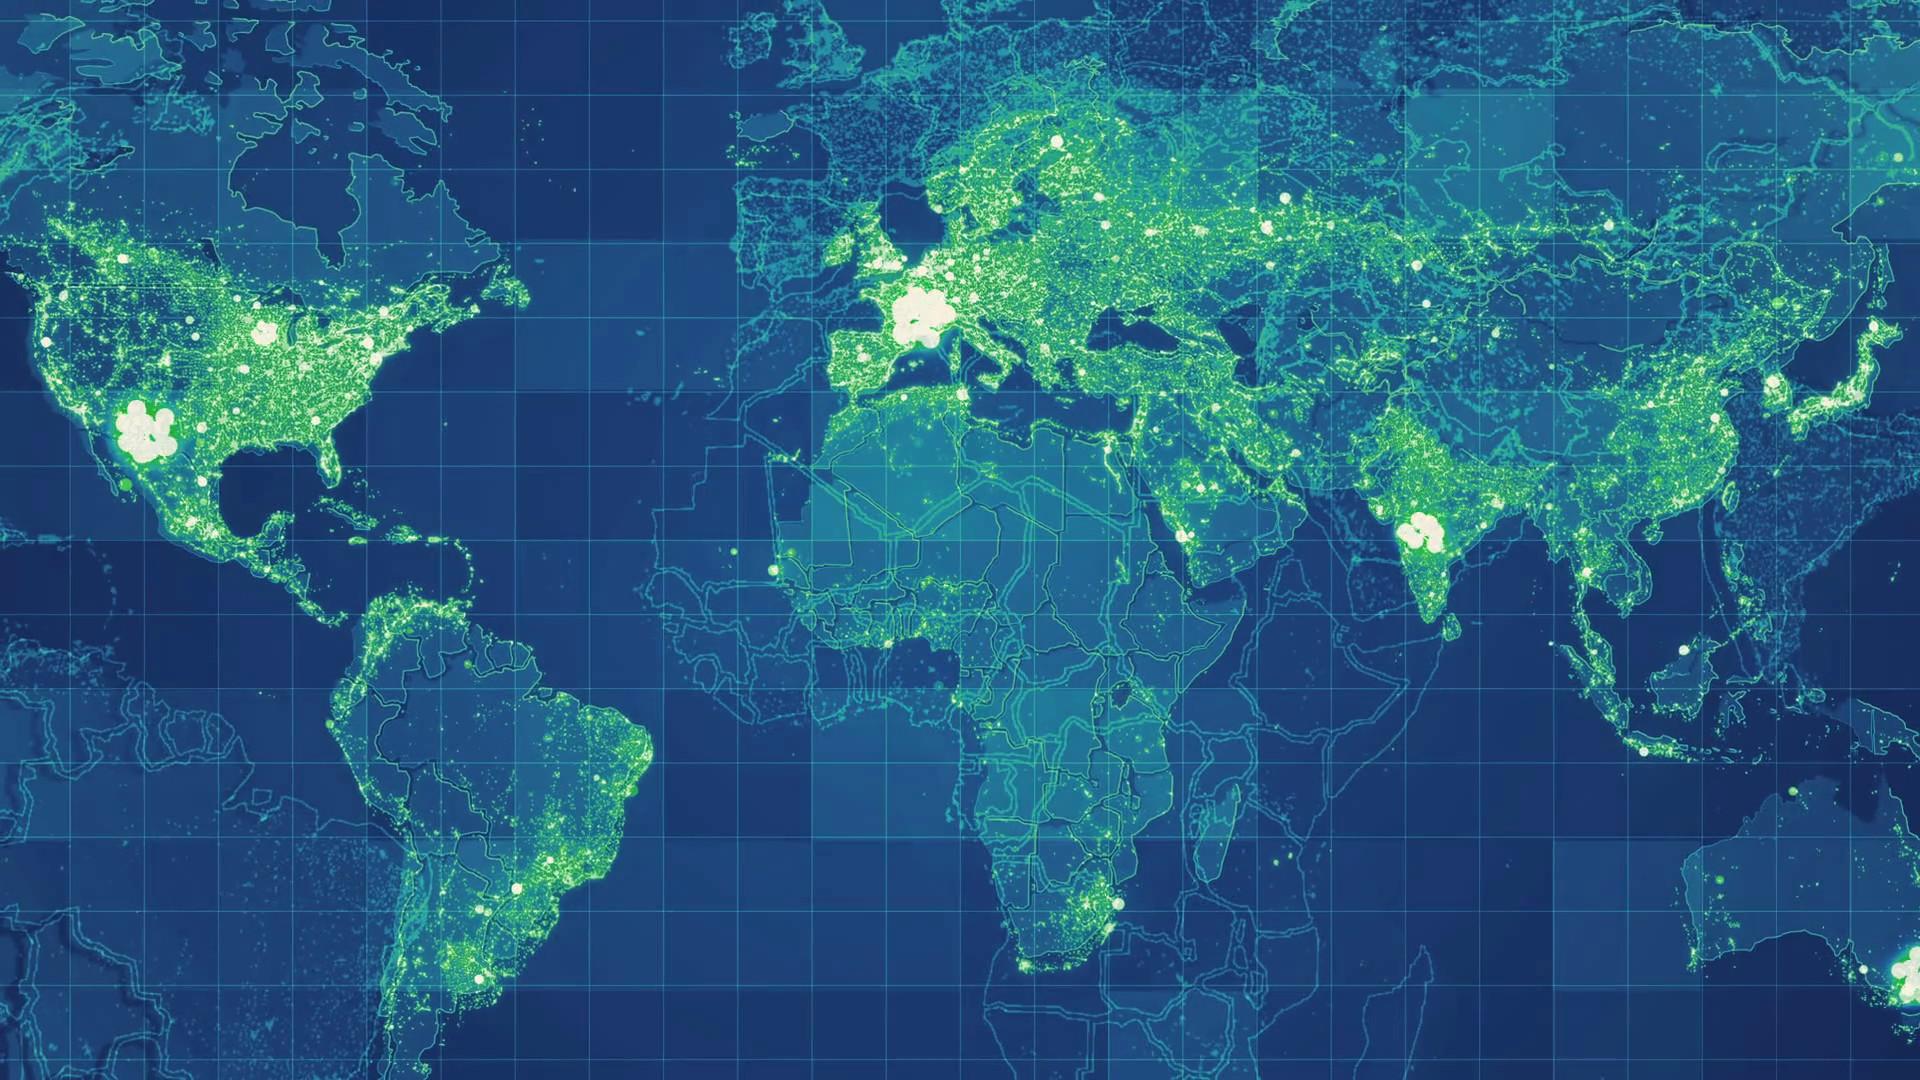 1920x1080, New Global Map Network Green - Ch Robinson - HD Wallpaper